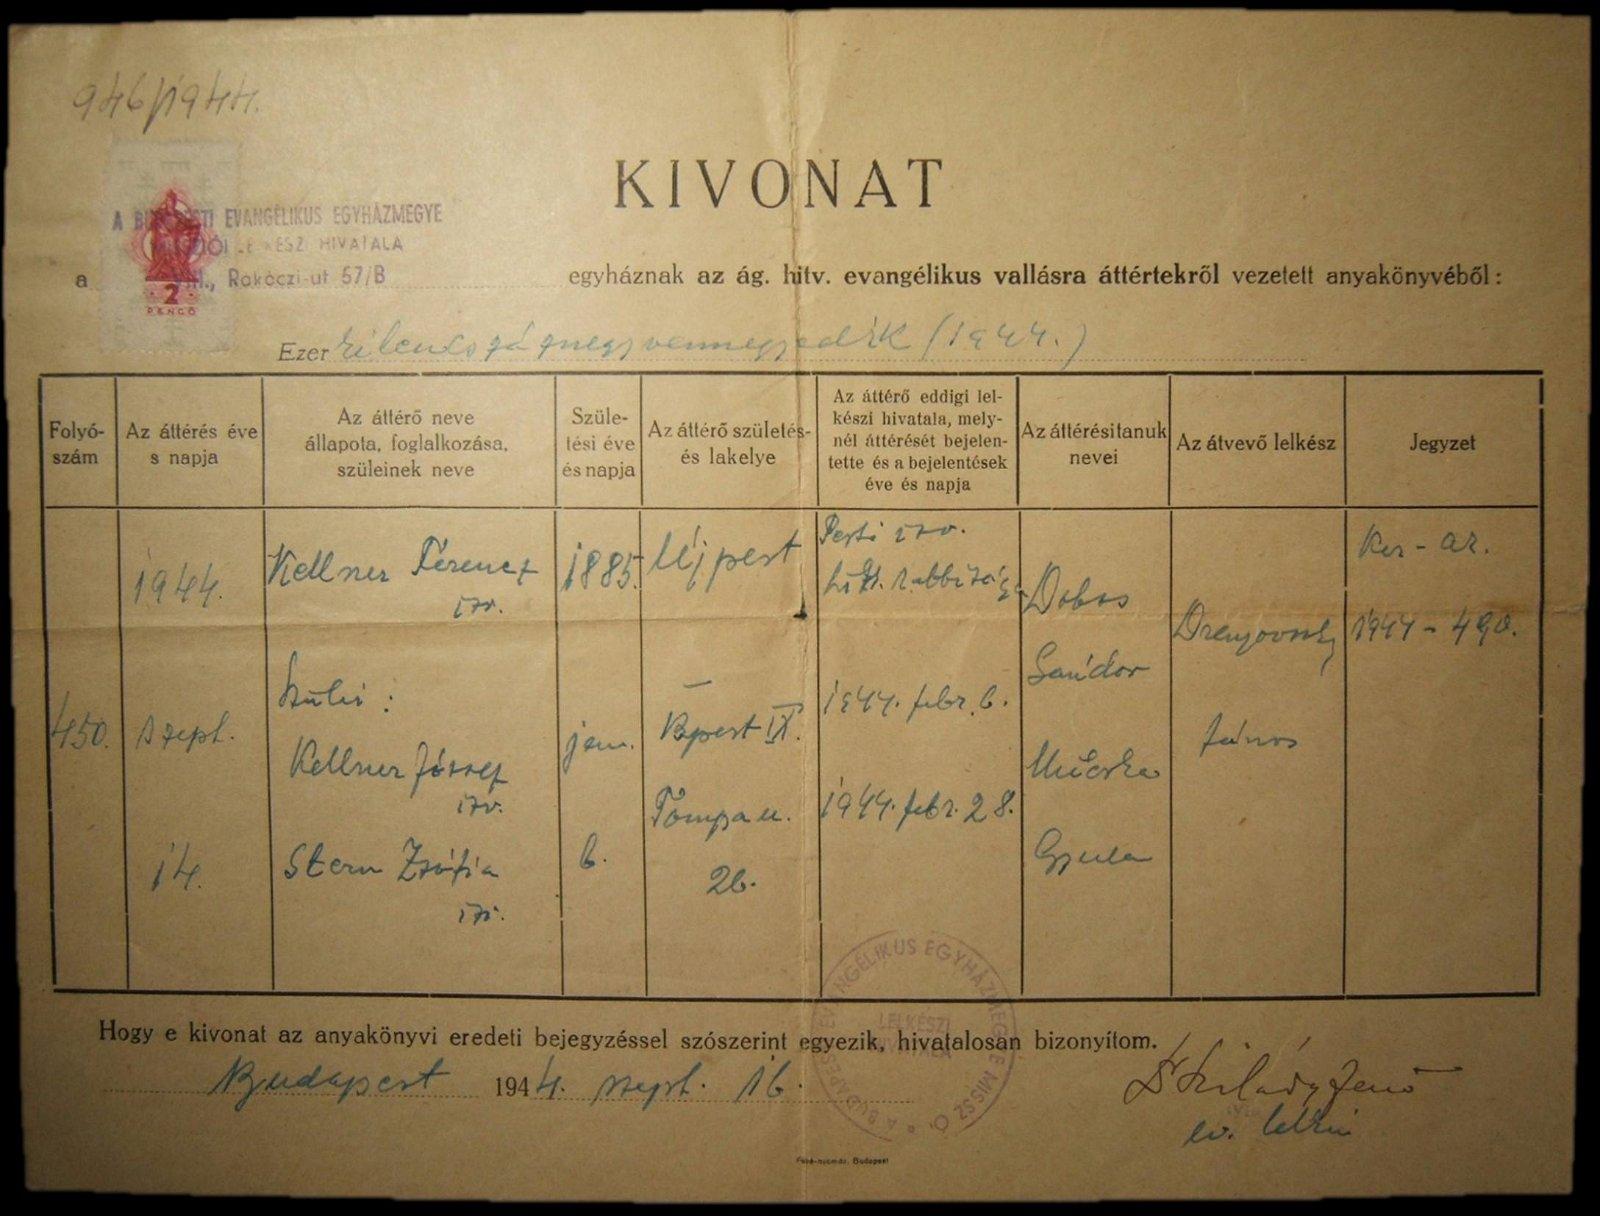 Holocaust-era Hungarian conversion document of Budpest